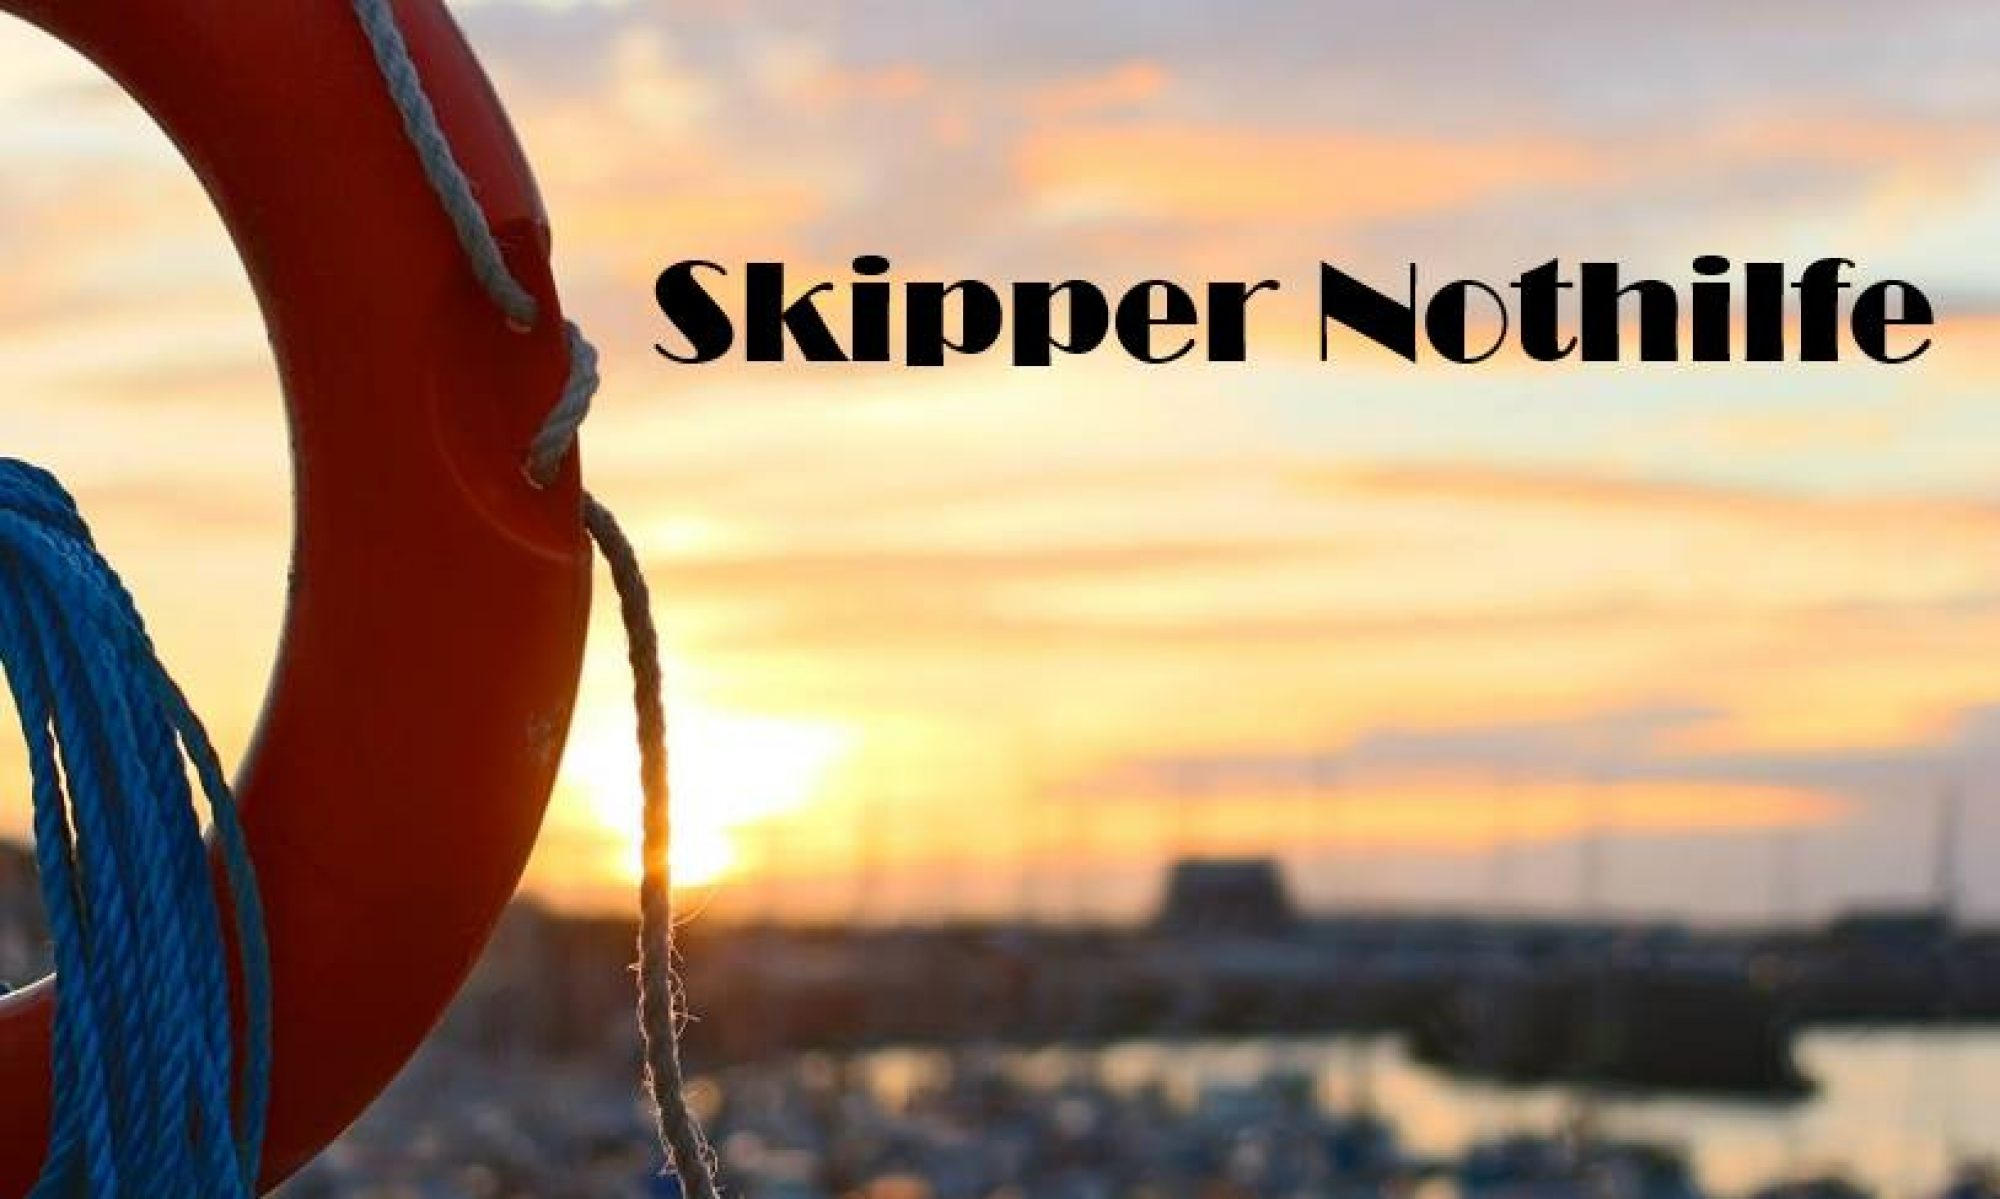 Skipper Nothilfe